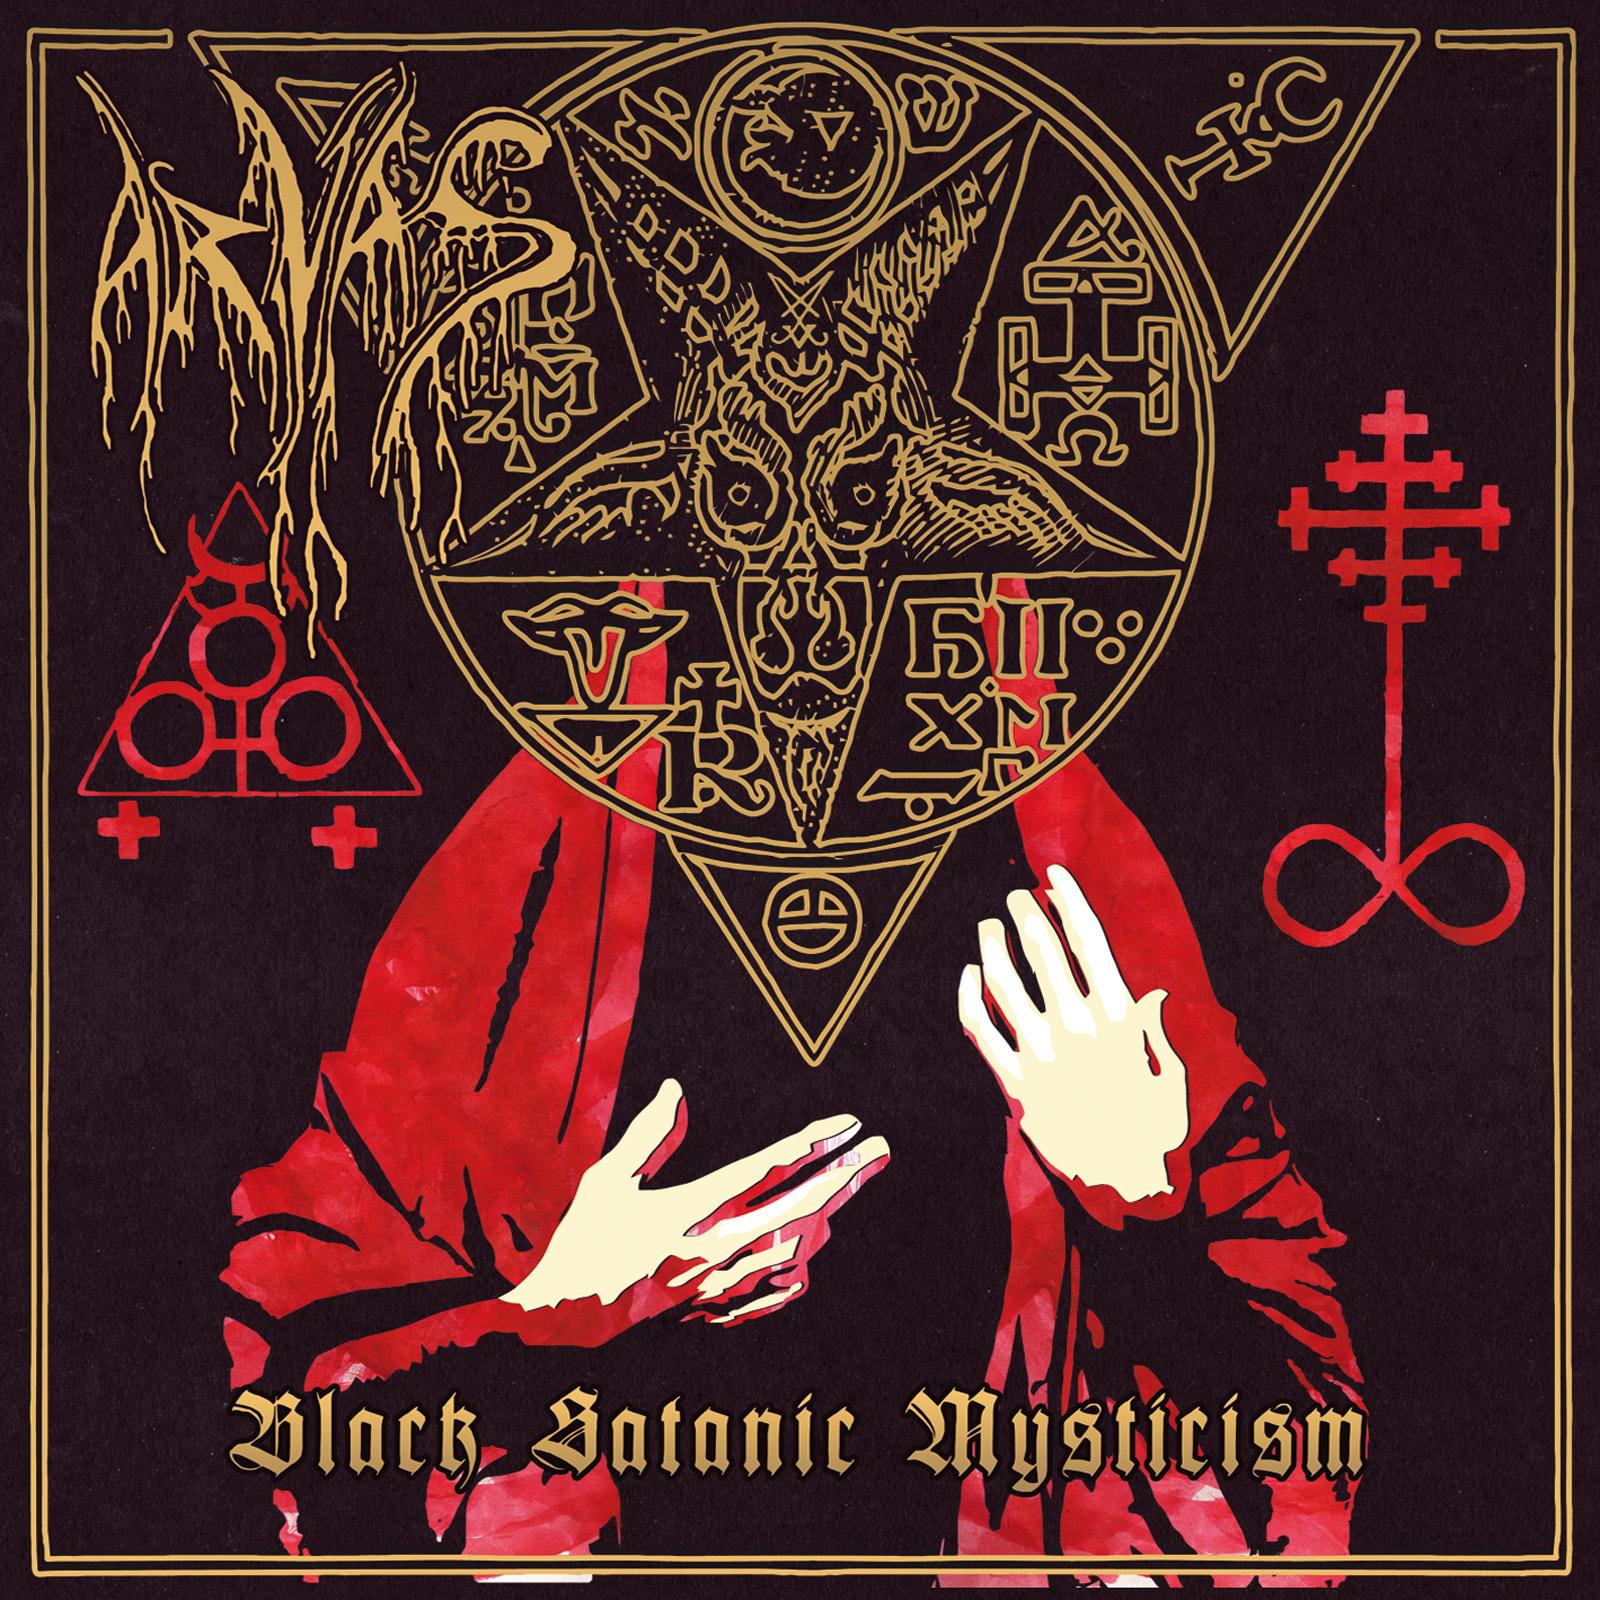 Arvas – Black Satanic Mysticism Review